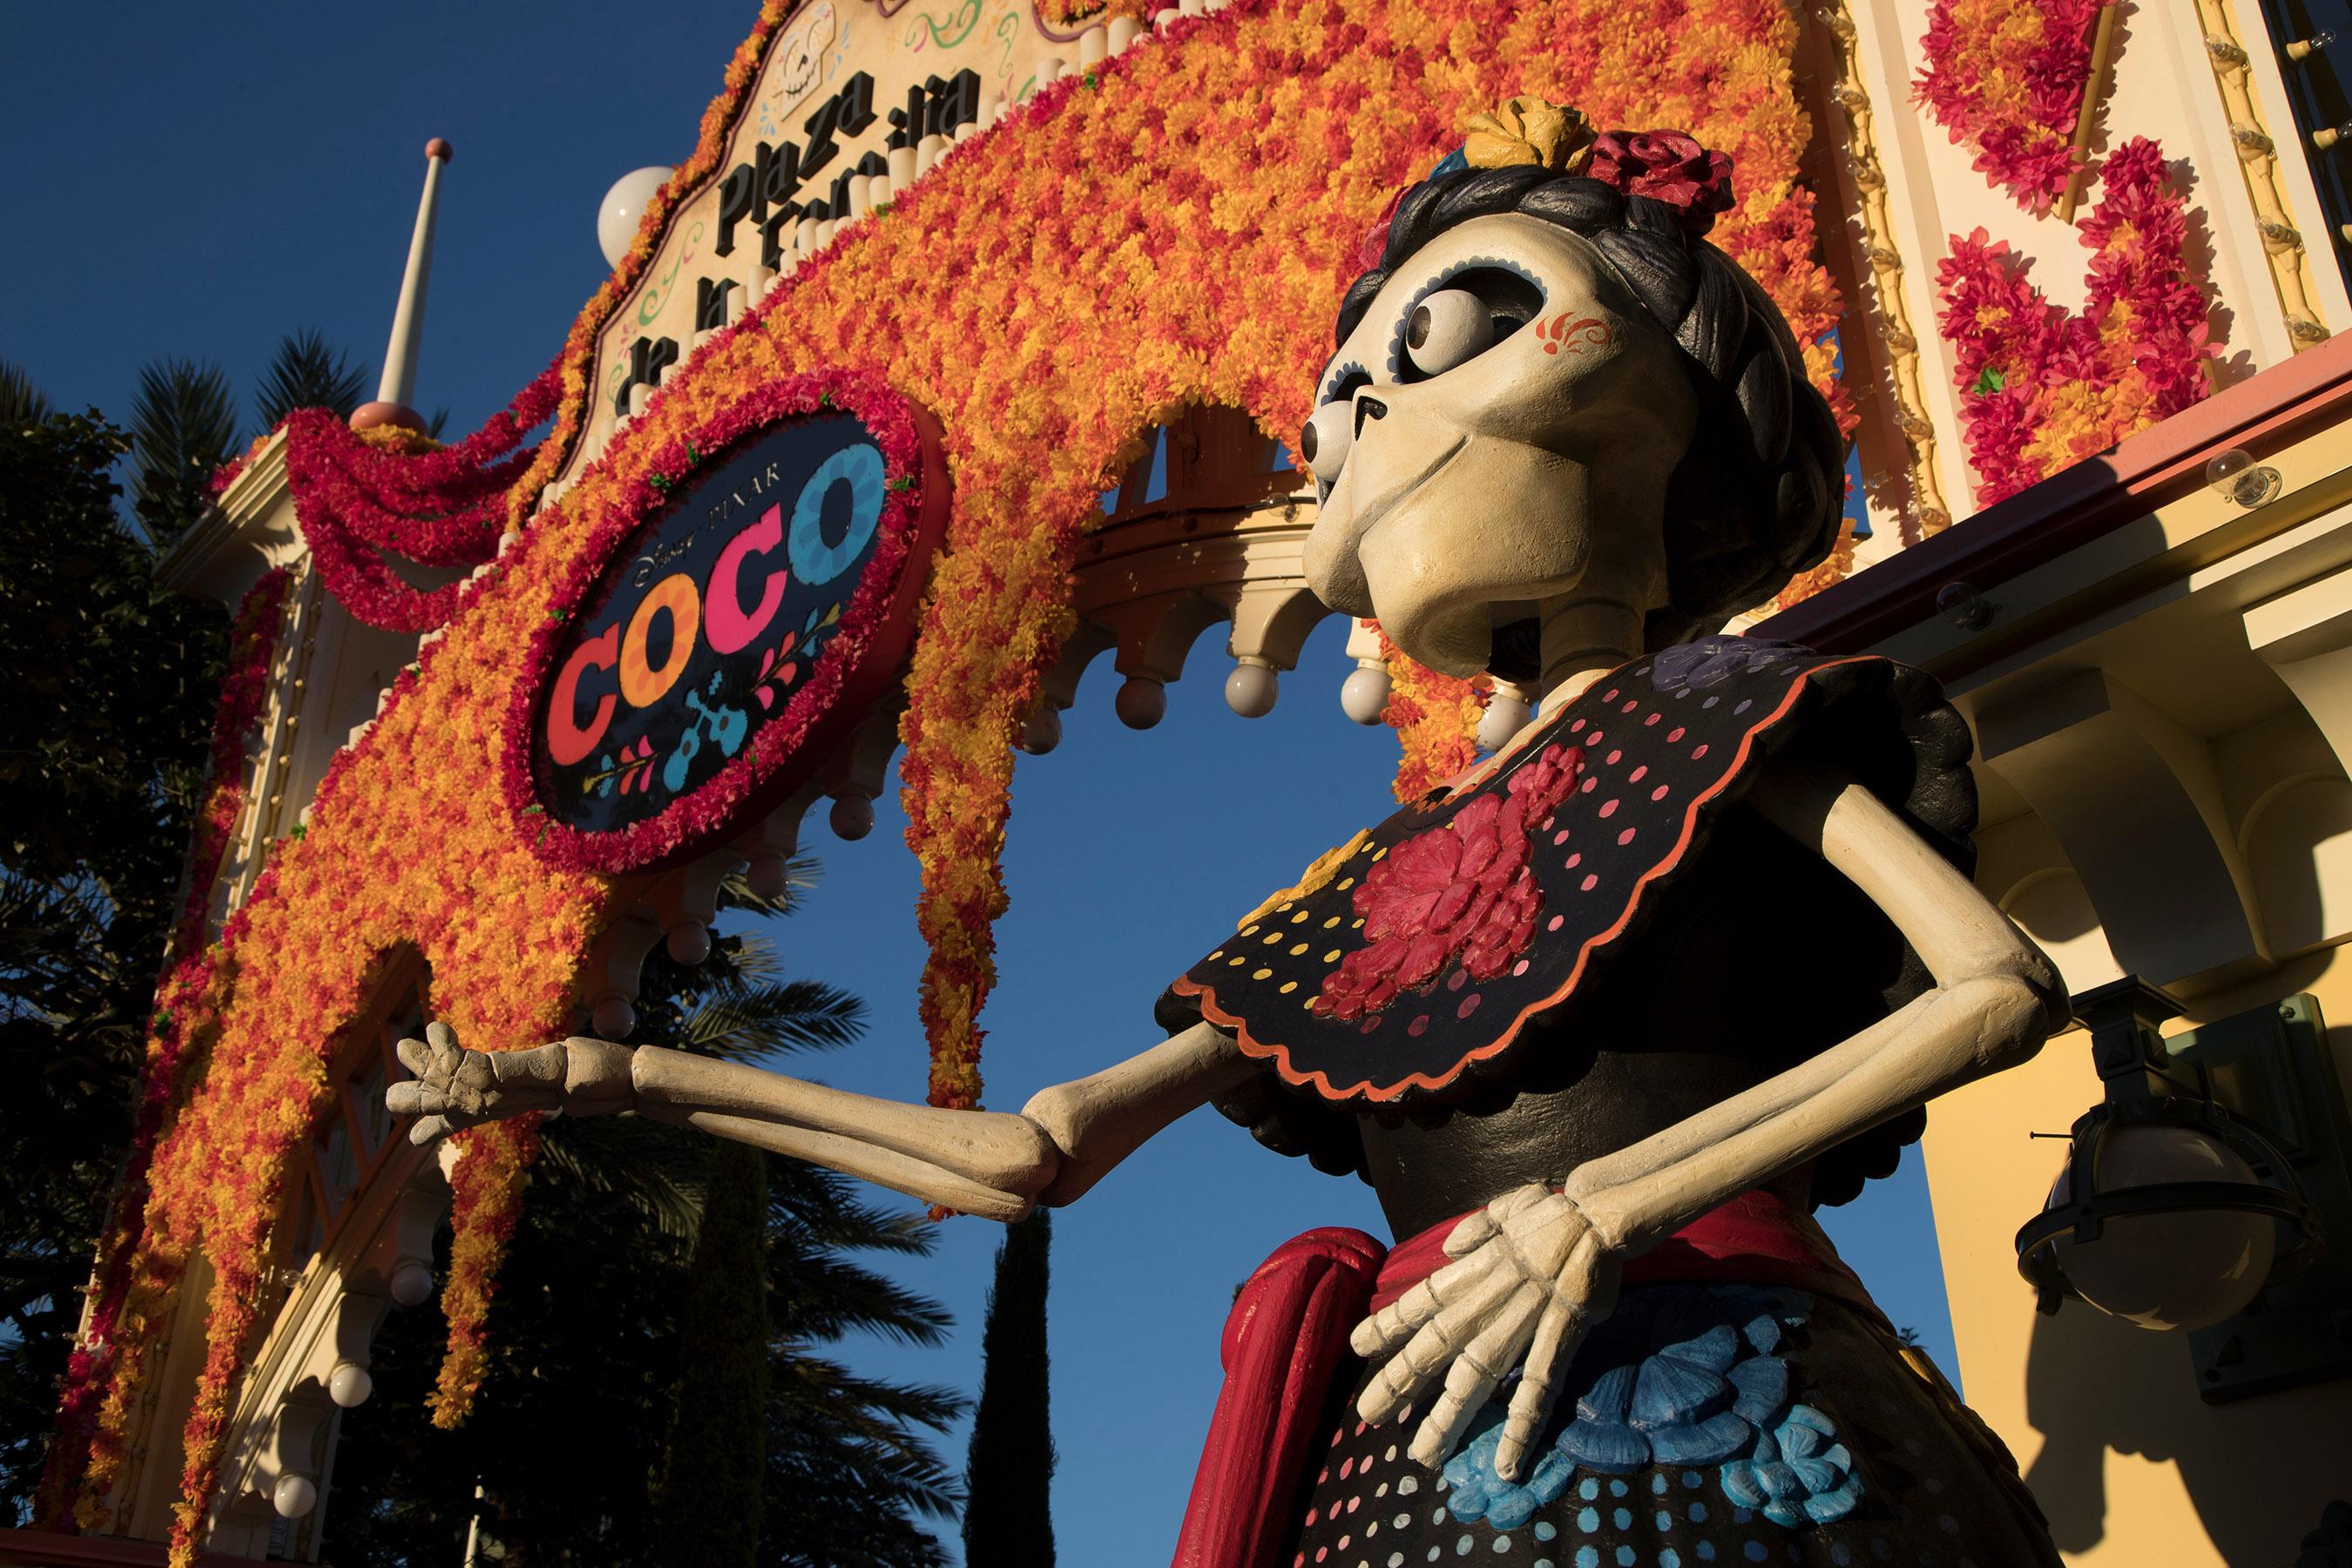 Celebrate DisneyPixars Coco and the Everlasting Bonds of Family at Disneyland Resort Sept. 7-Nov. 4 2018